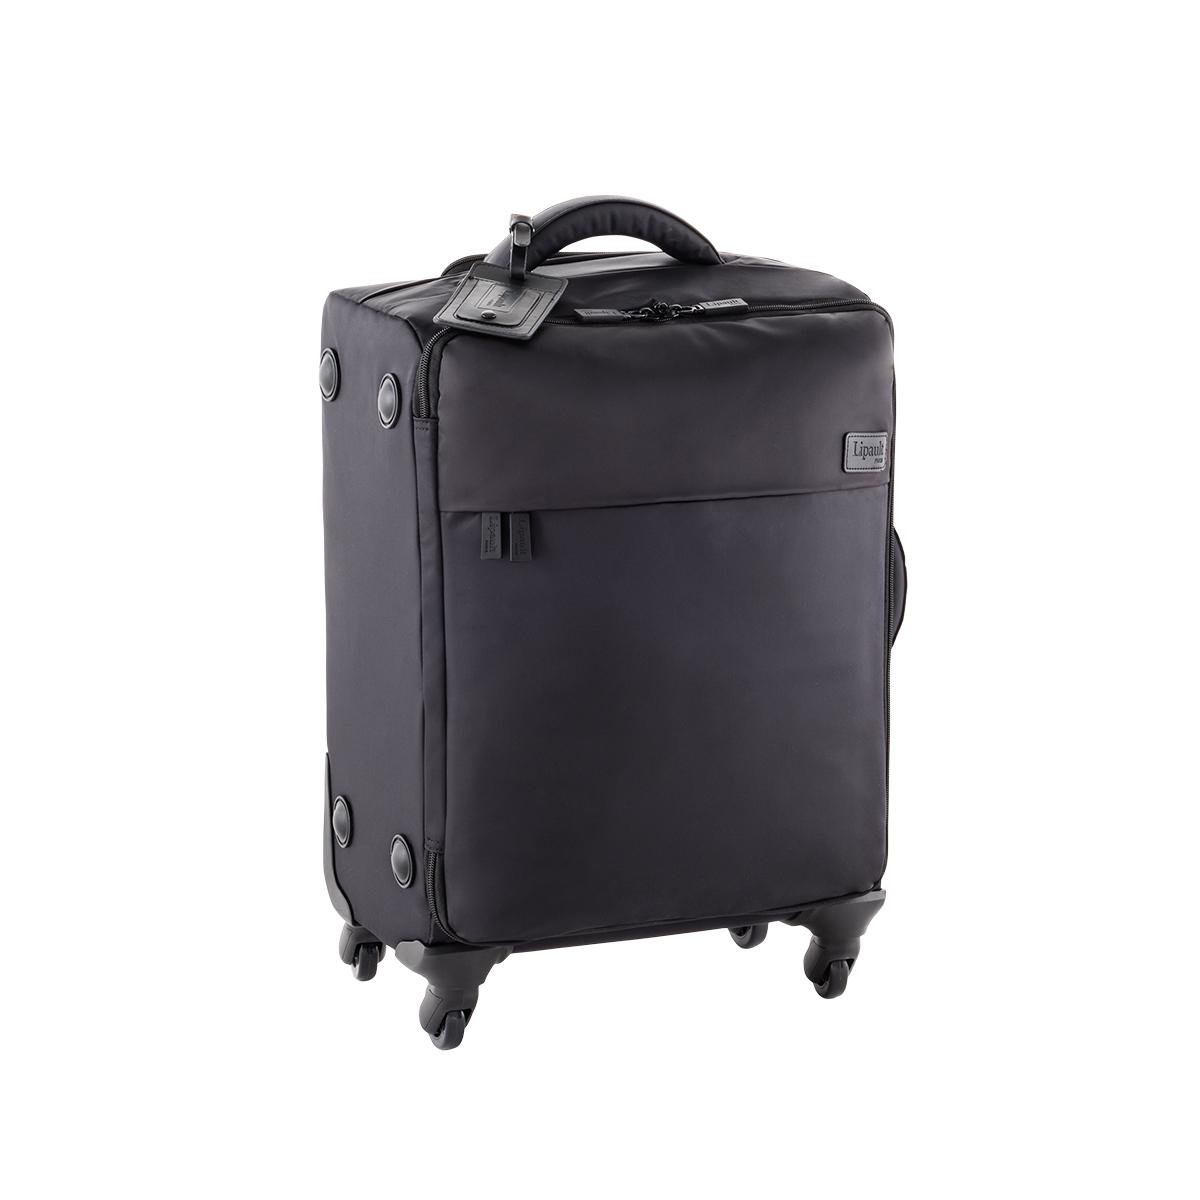 Paris 4-Wheeled Luggage